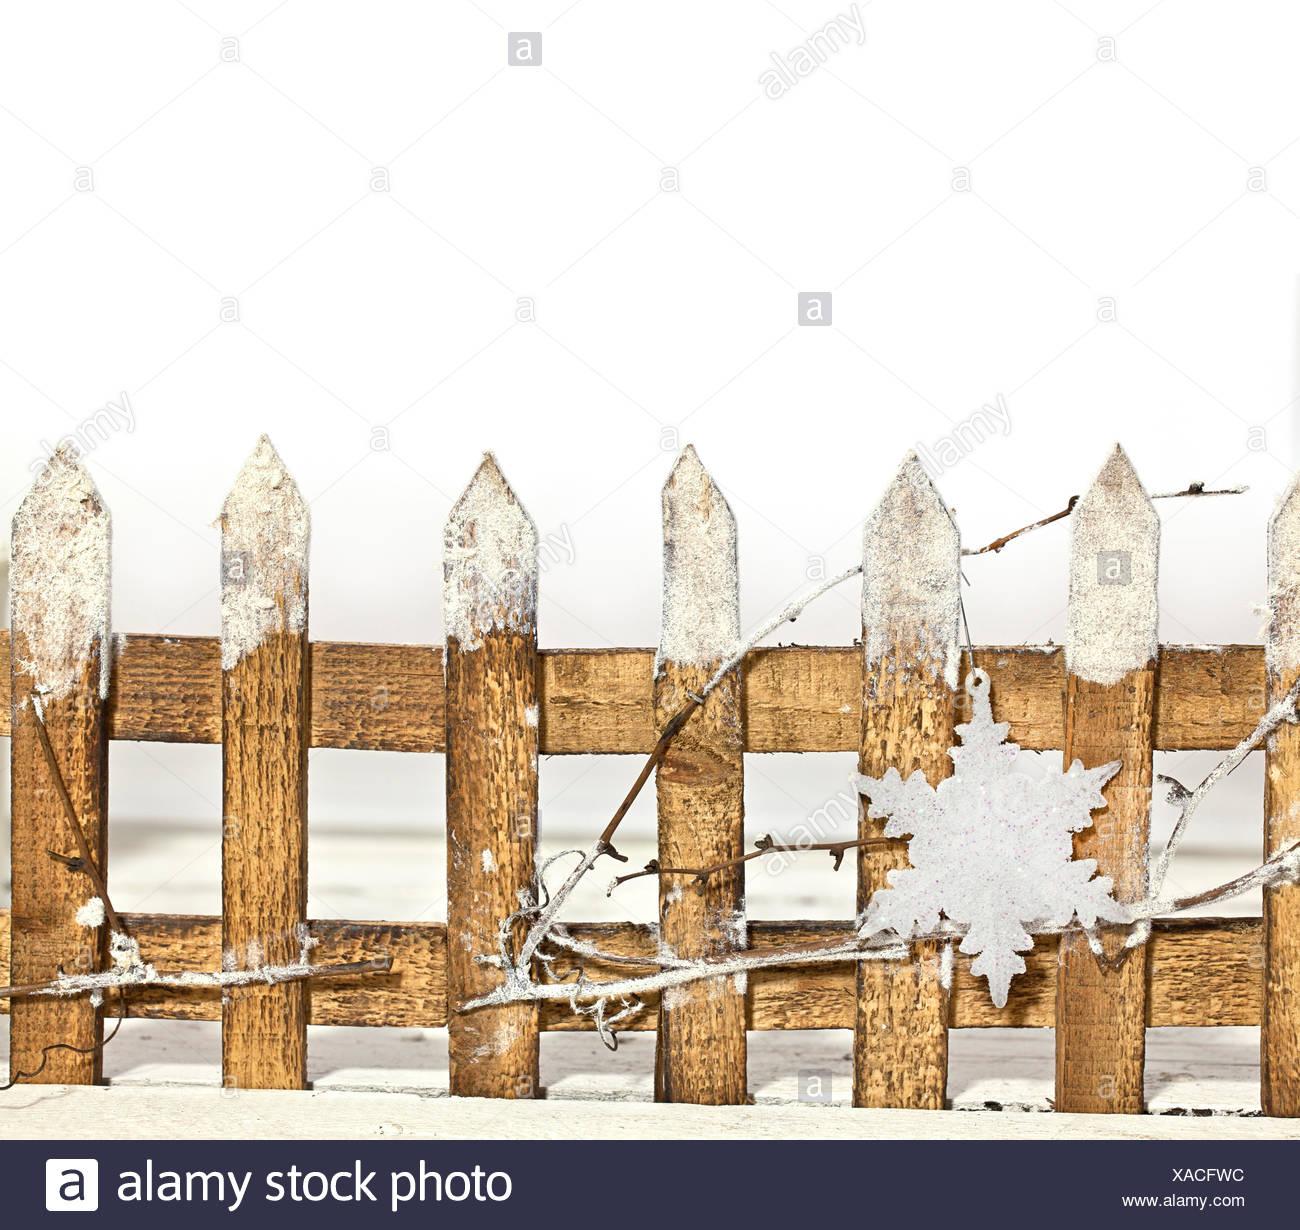 Deko fence with star - Stock Image